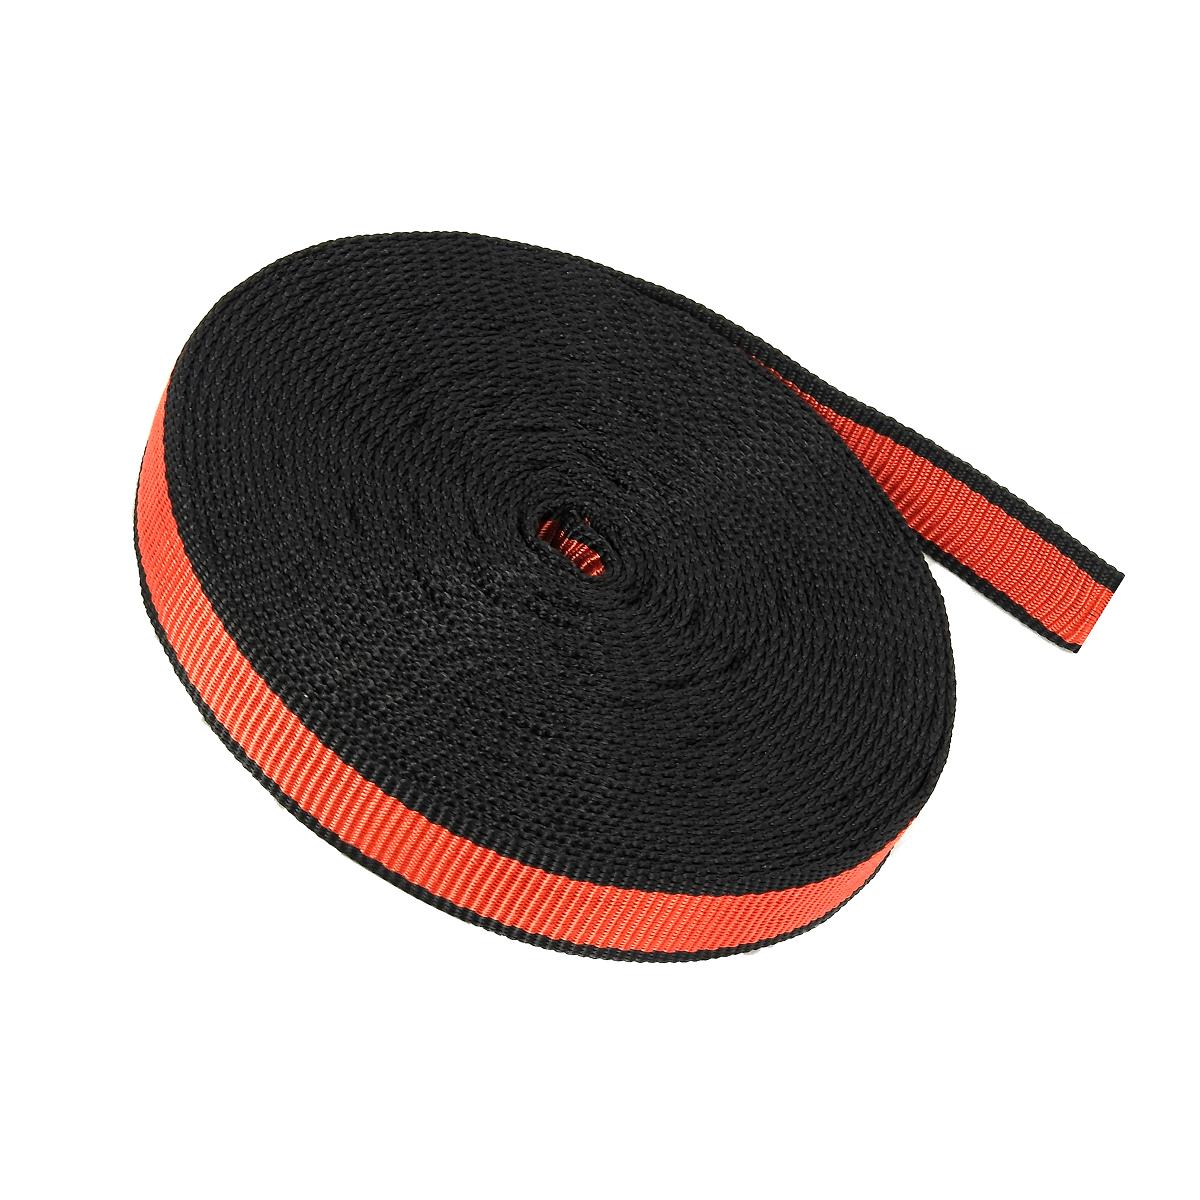 Fita Tubular 25mm 22kN Vermelha (Rolo 10 Metros) - Exclusividade ALPIMONTE